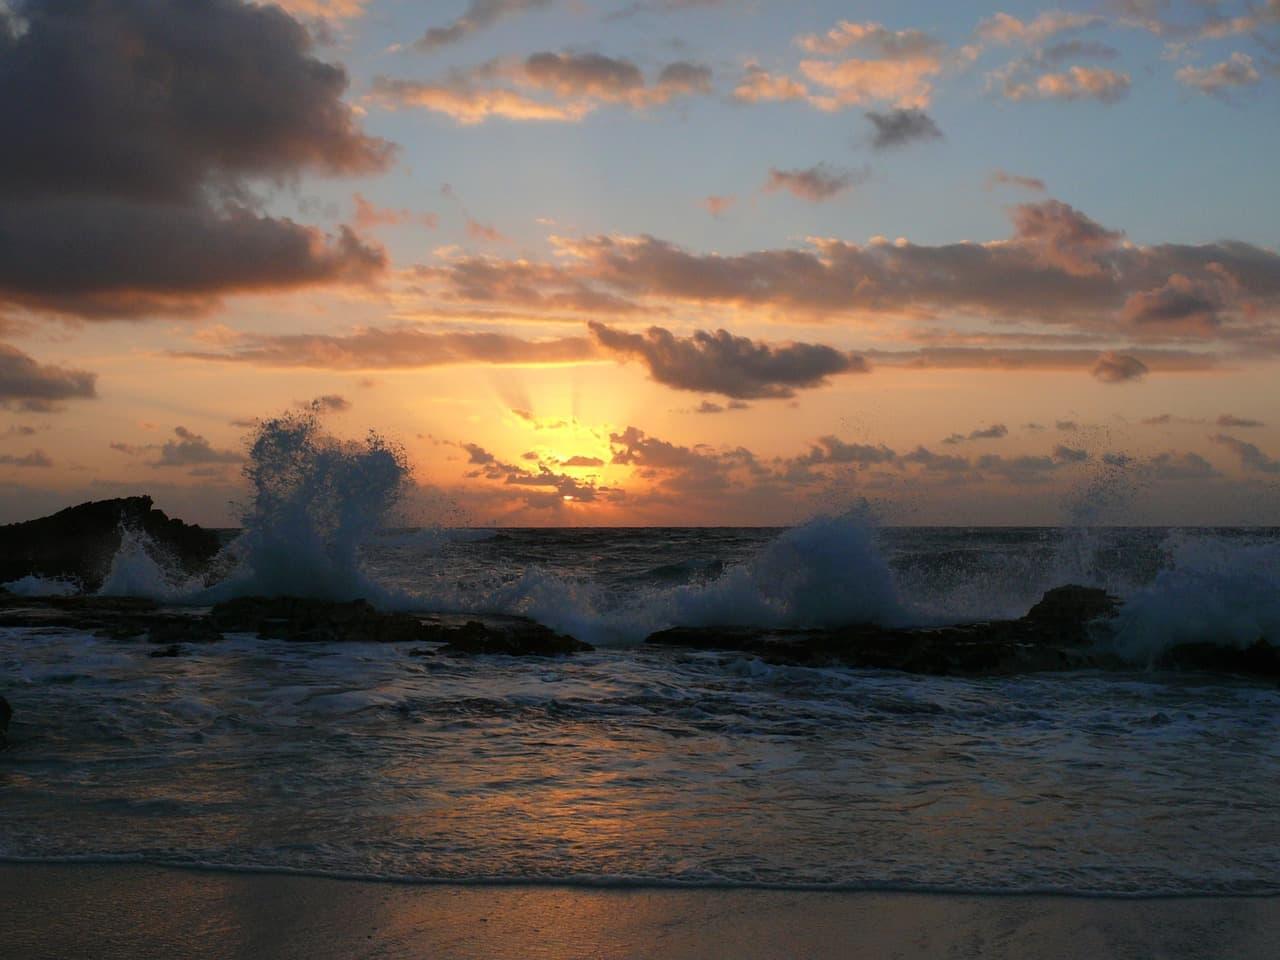 Playa Palancar en isla de Cozumel